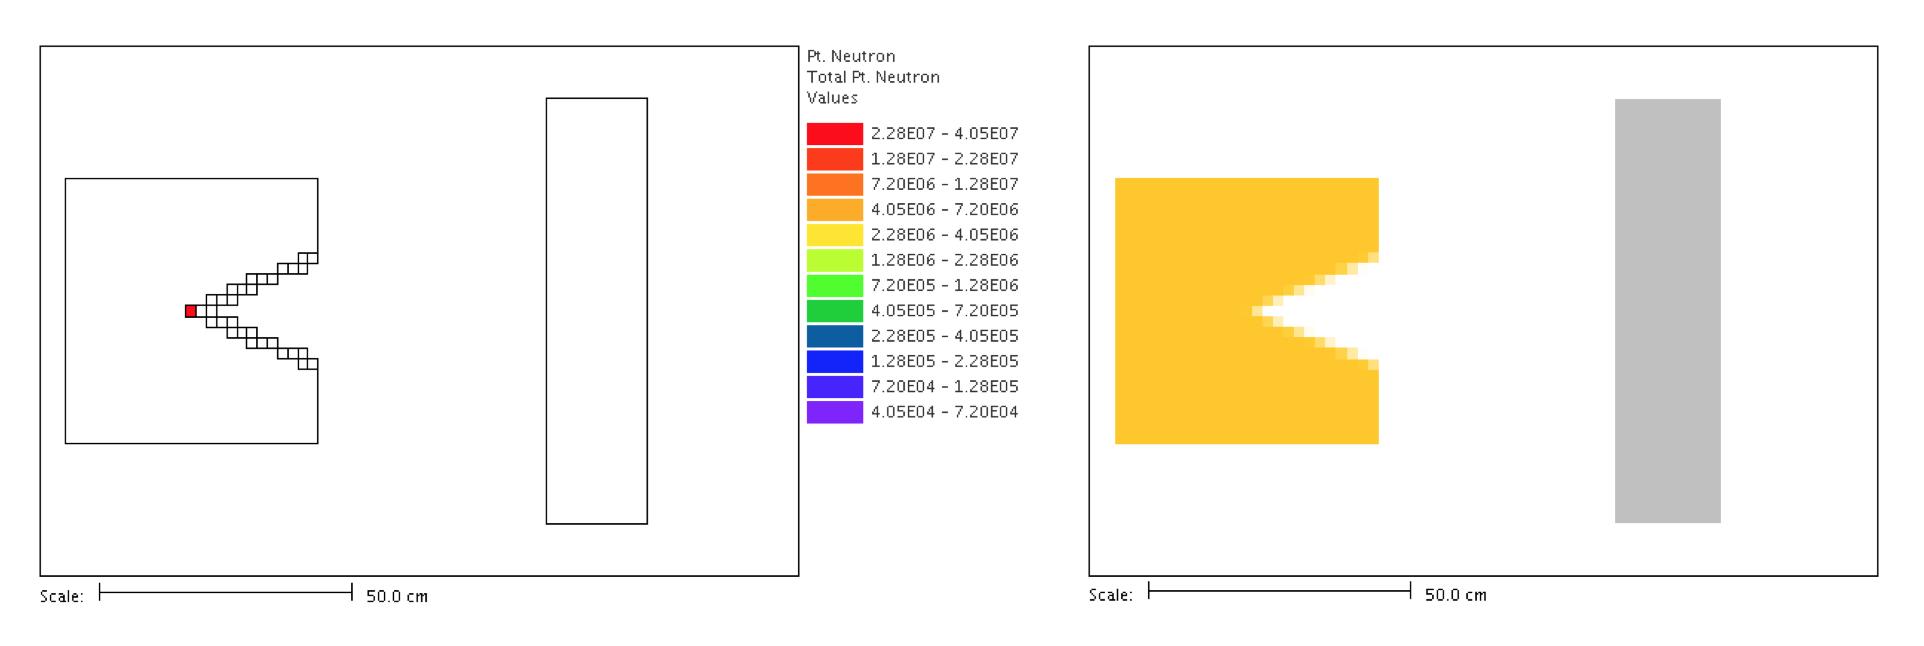 _build/html/_images/fig4c5.png